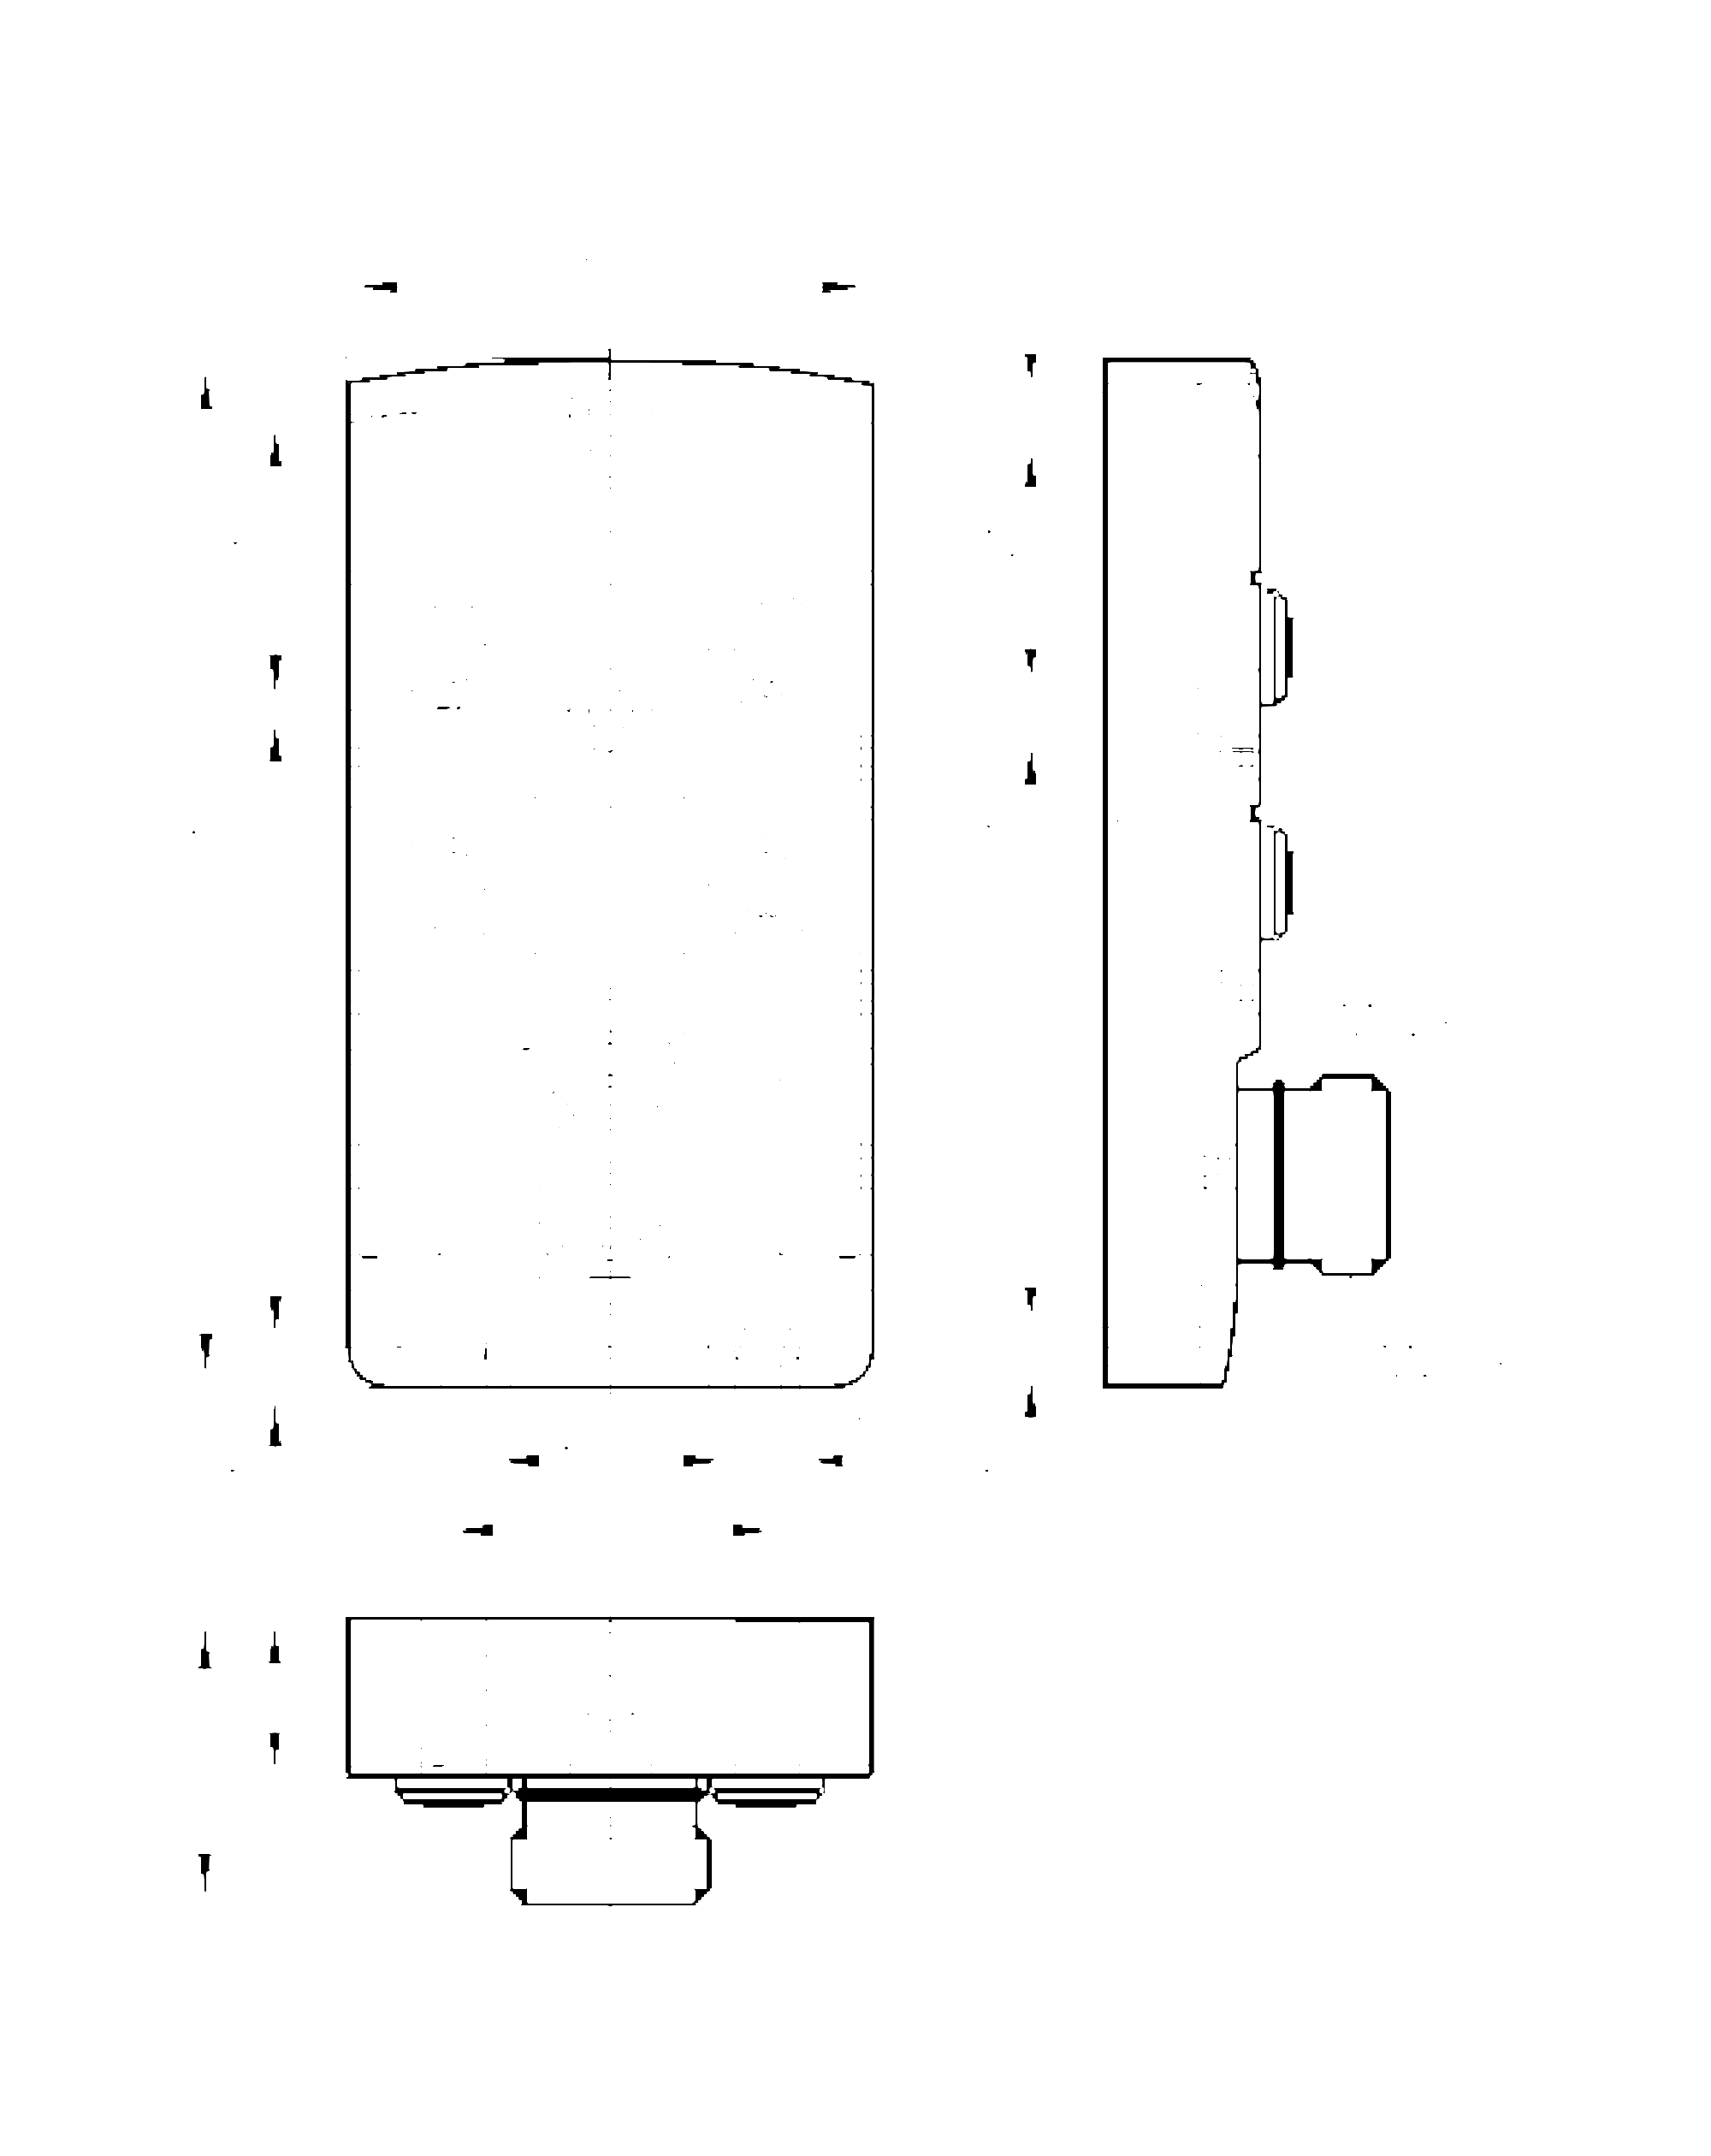 ebc001 - wiring block